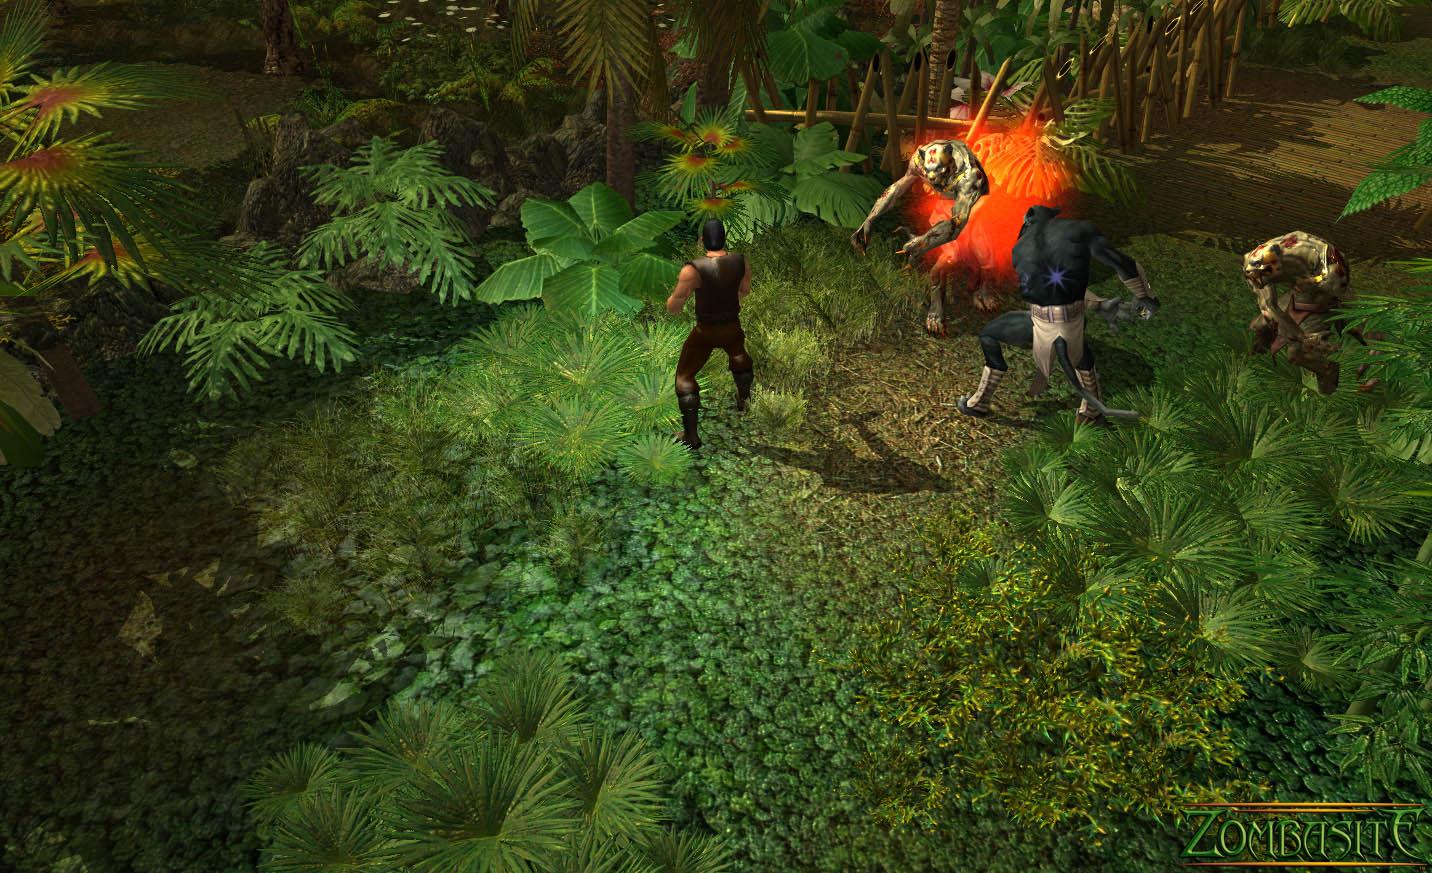 Zombasite screenshot